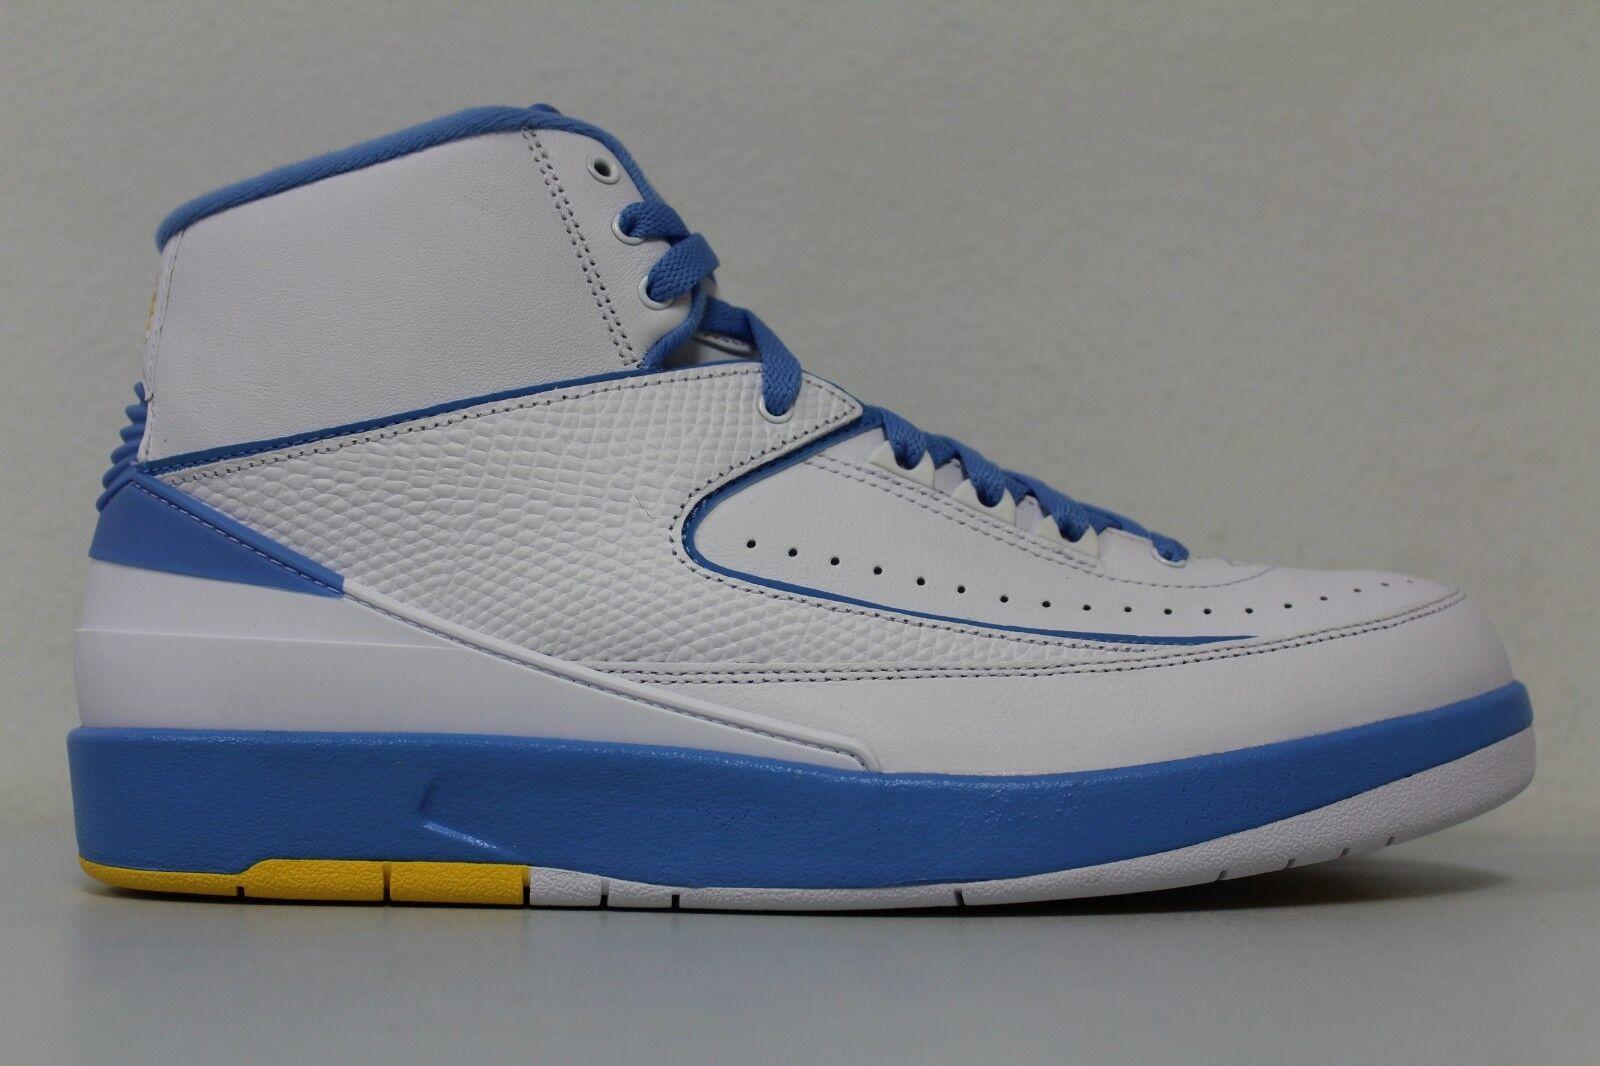 Nike air Uomo jordan 2 retrò melo Uomo air bianco blu 385475 università 122 dimensioni 10,5 b646df